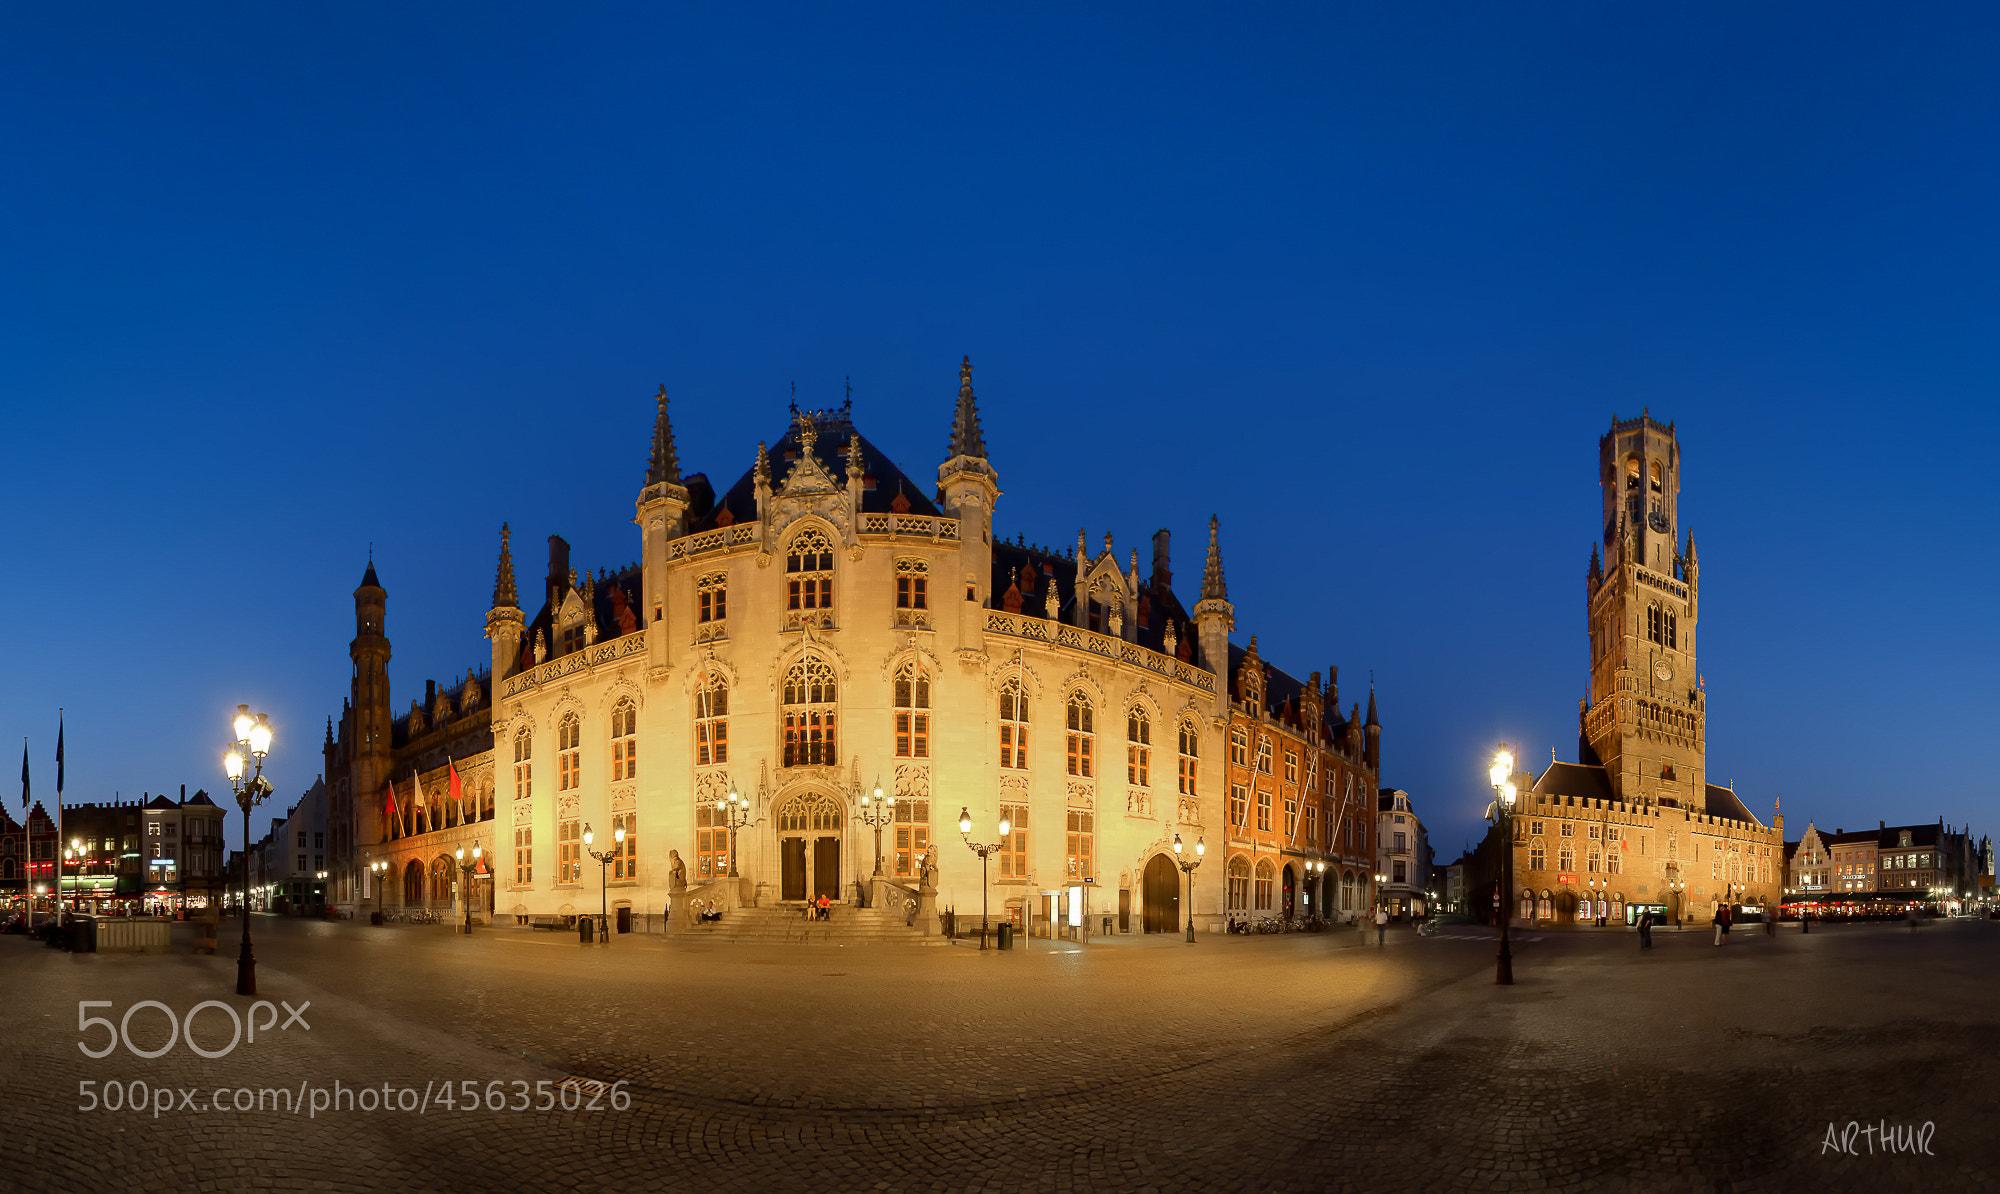 Photograph Grote Markt by Arthur Brunner on 500px